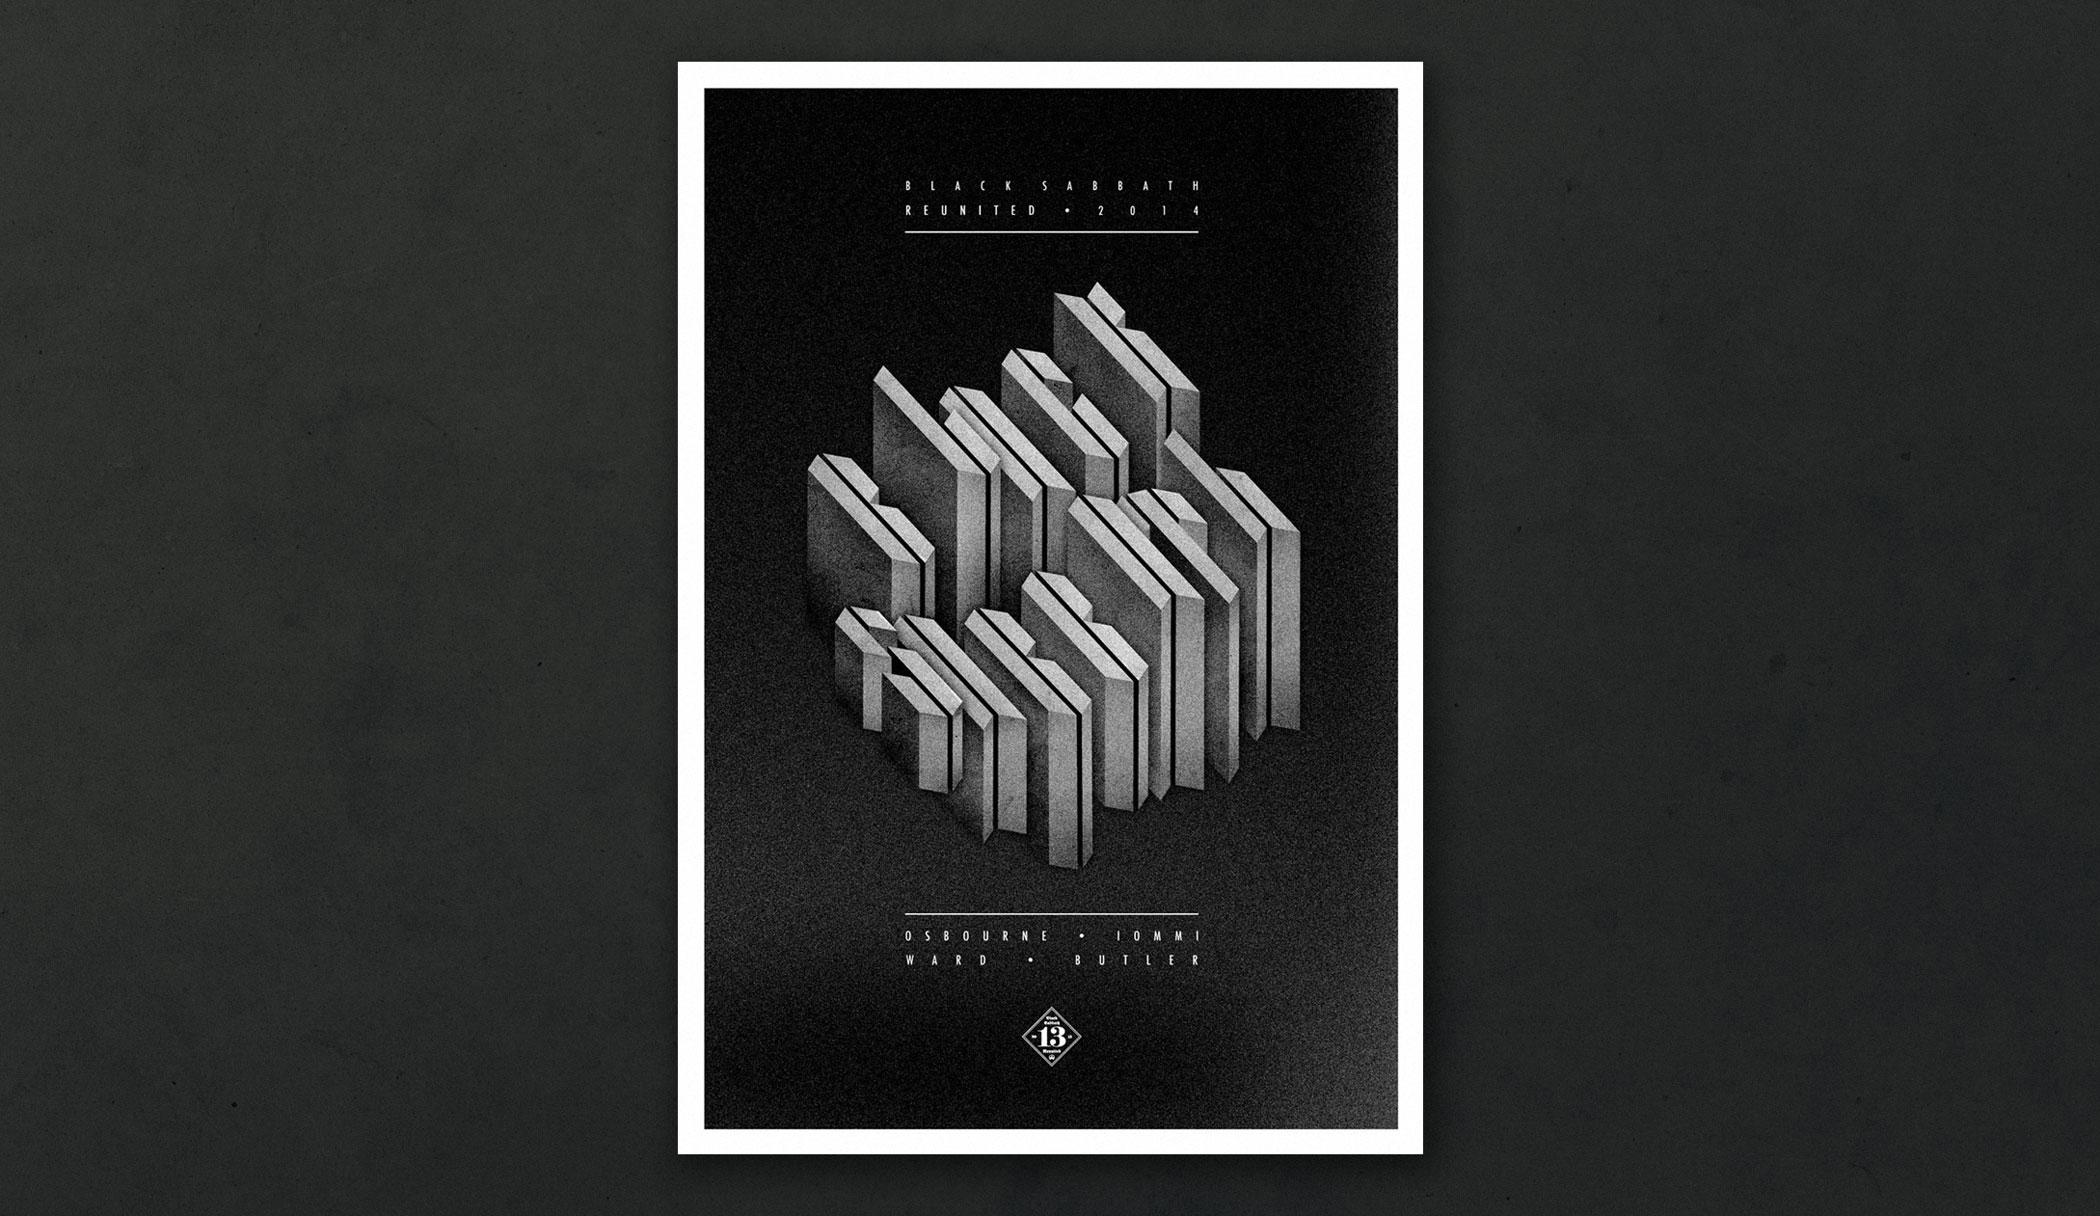 black-sabbath-poster.jpg